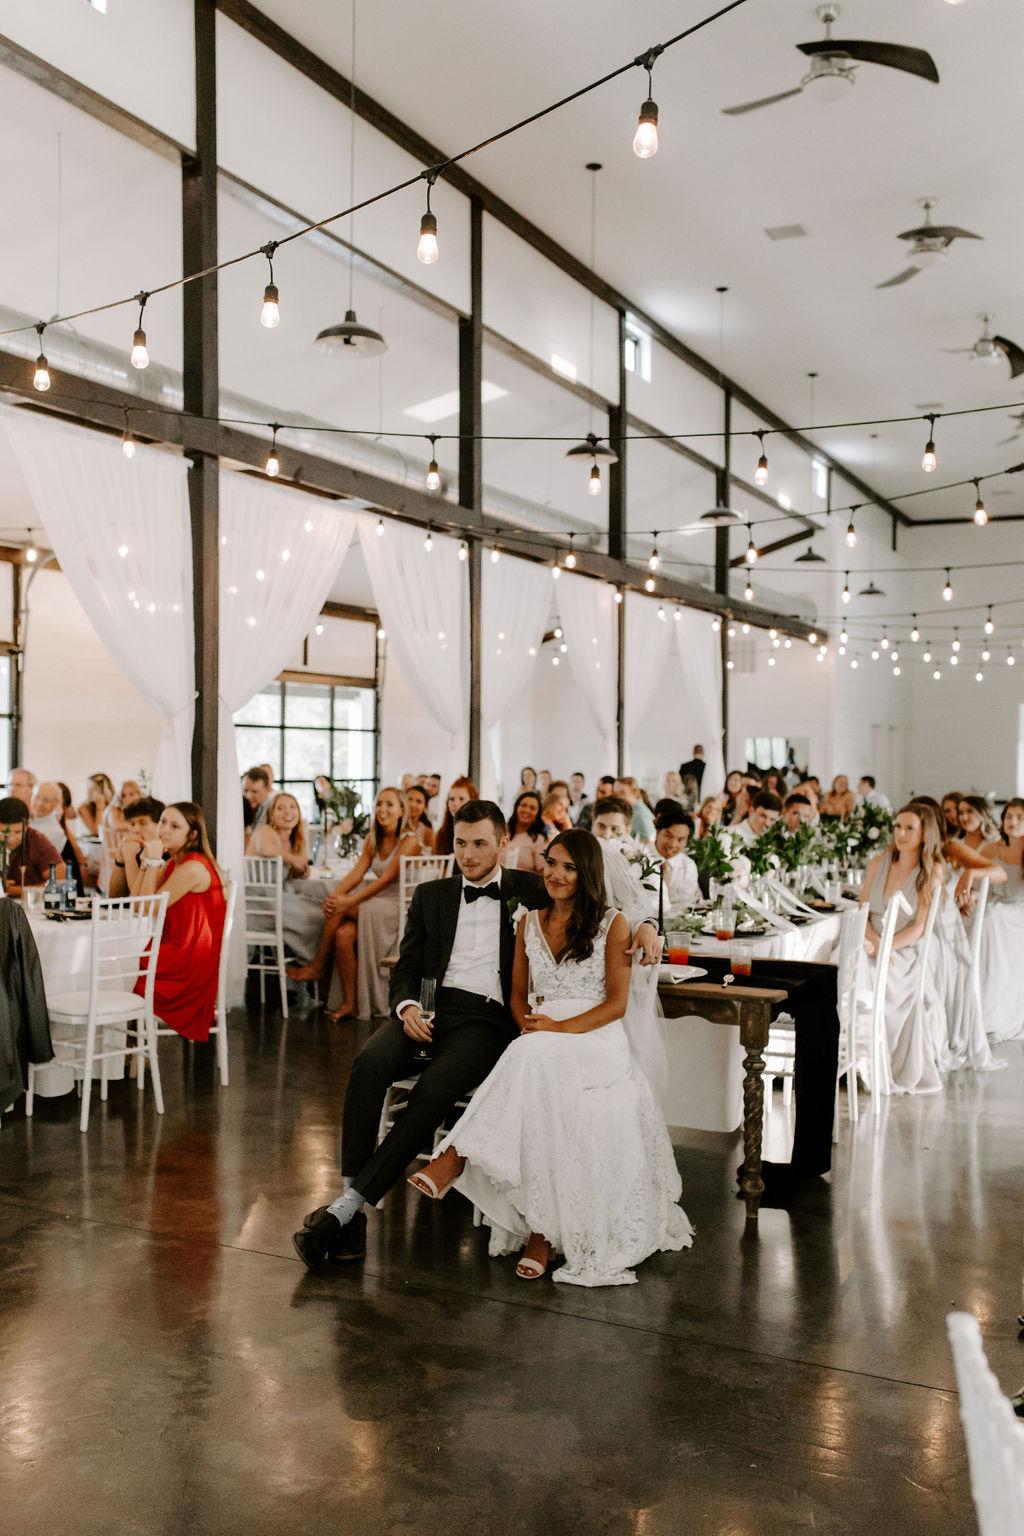 Tulsa White Barn Wedding Venue Outdoor Ceremony 109.jpg